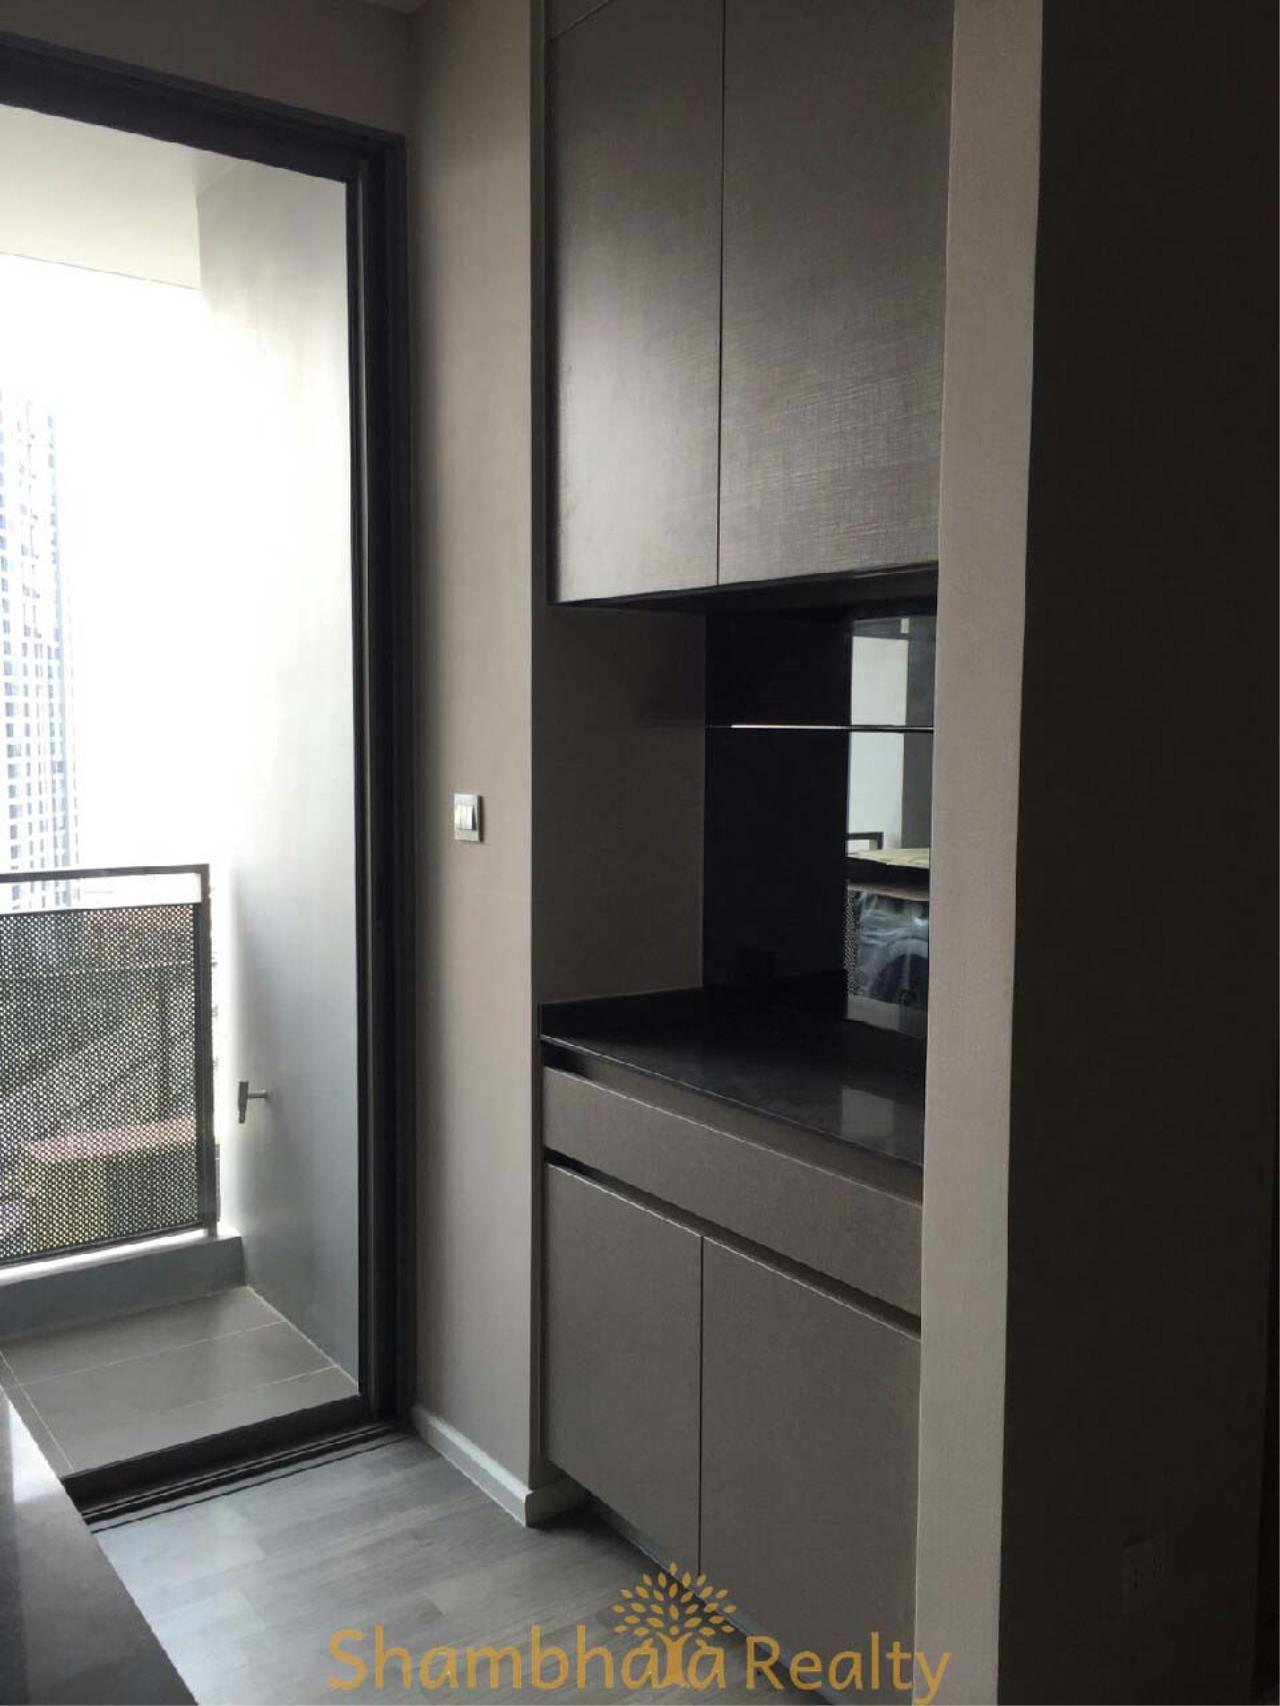 Shambhala Realty Agency's The Room Sukhumvit 69 Condominium for Rent in Sukhumvit 69 8